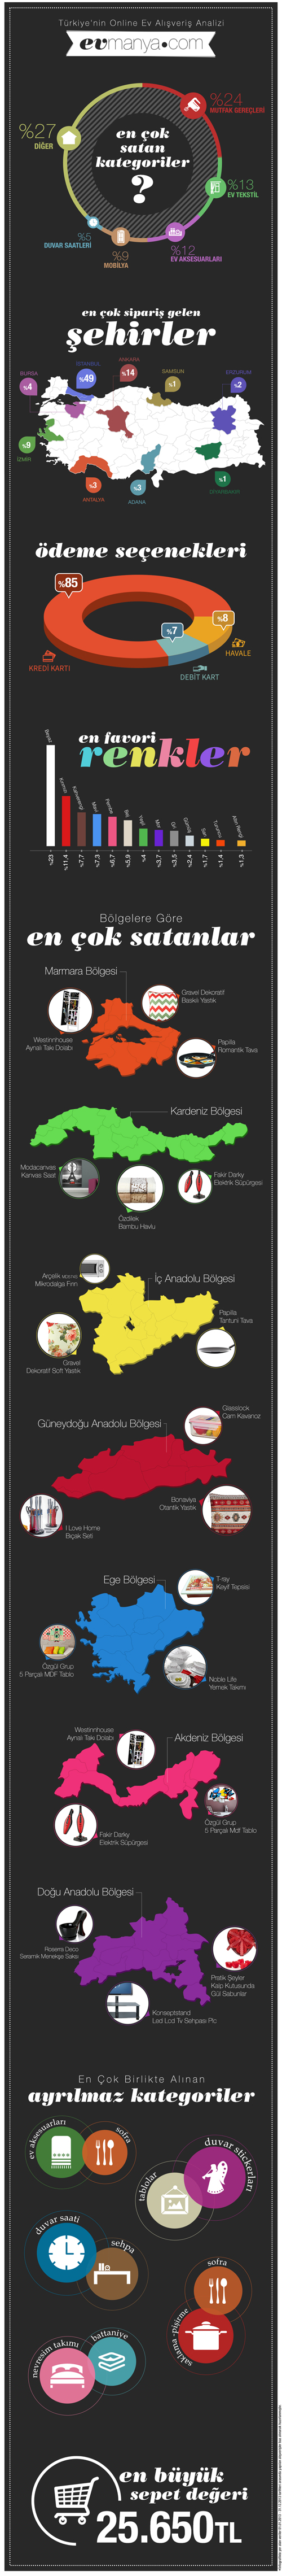 selfie_infografik